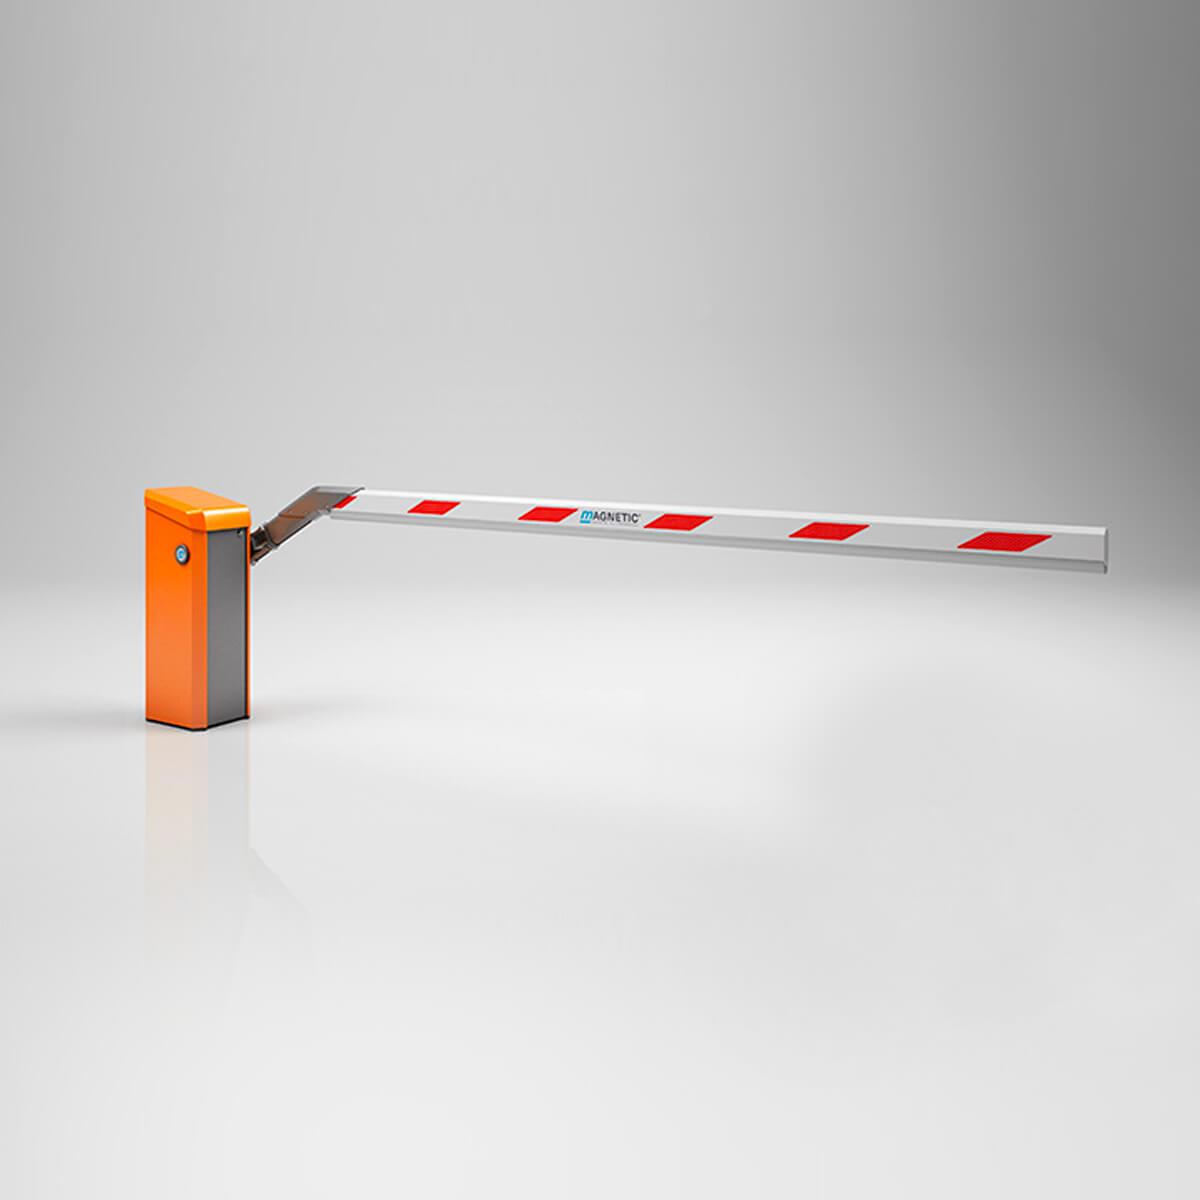 Magnetic Access L Barrier in UAE, Qatar and Saudi Arabia